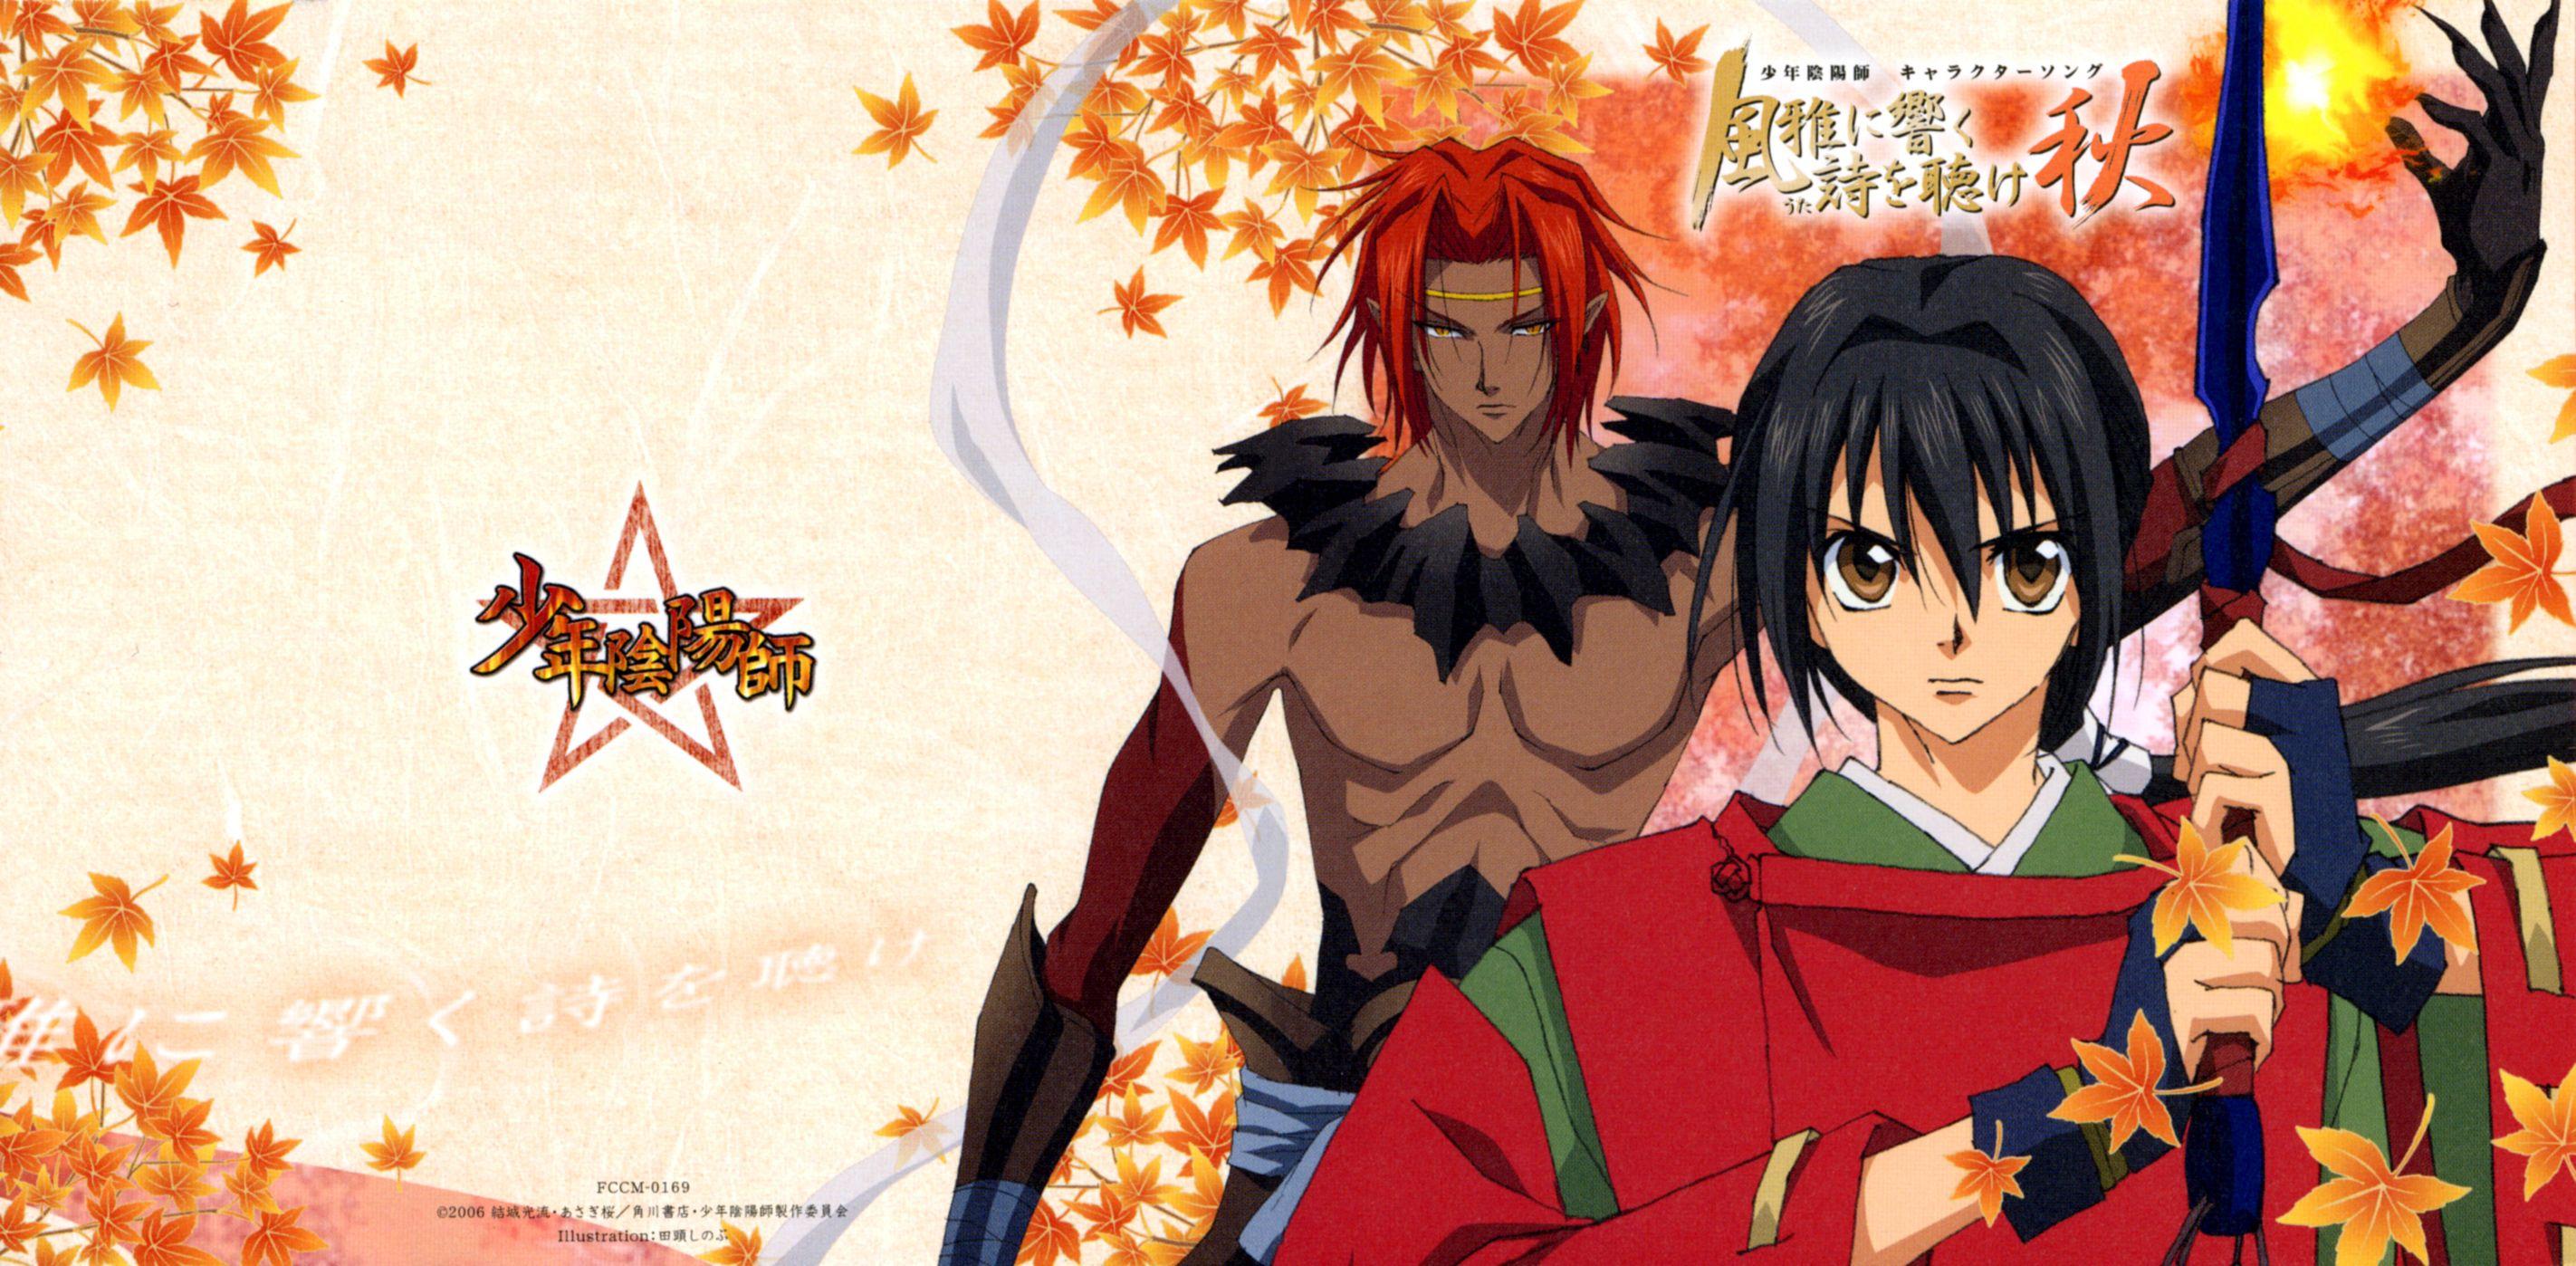 Shonen Onmyouji Anime Anime Images Shonen